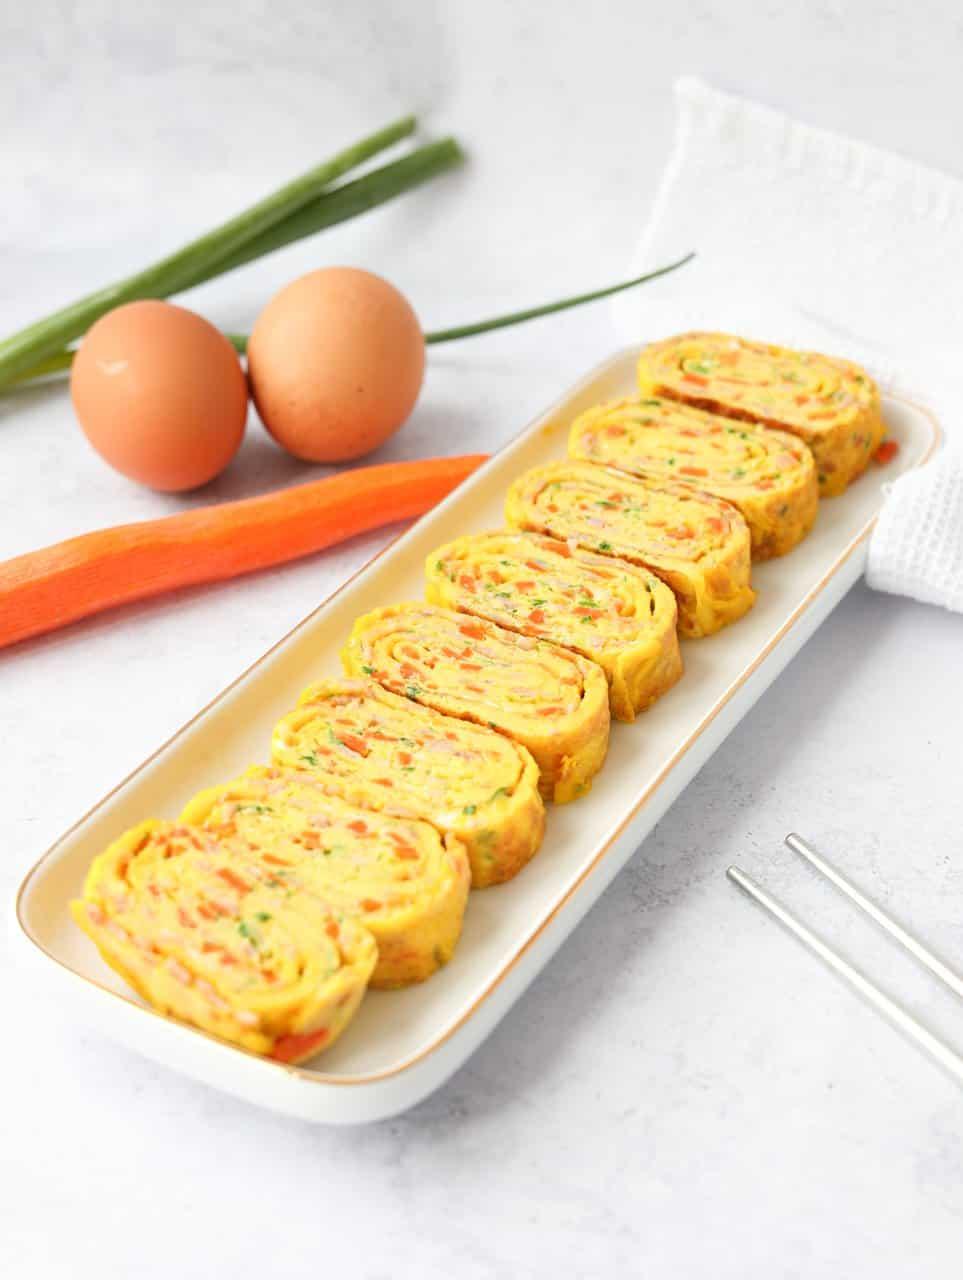 Gyeran Mari Korean Rolled Omelette